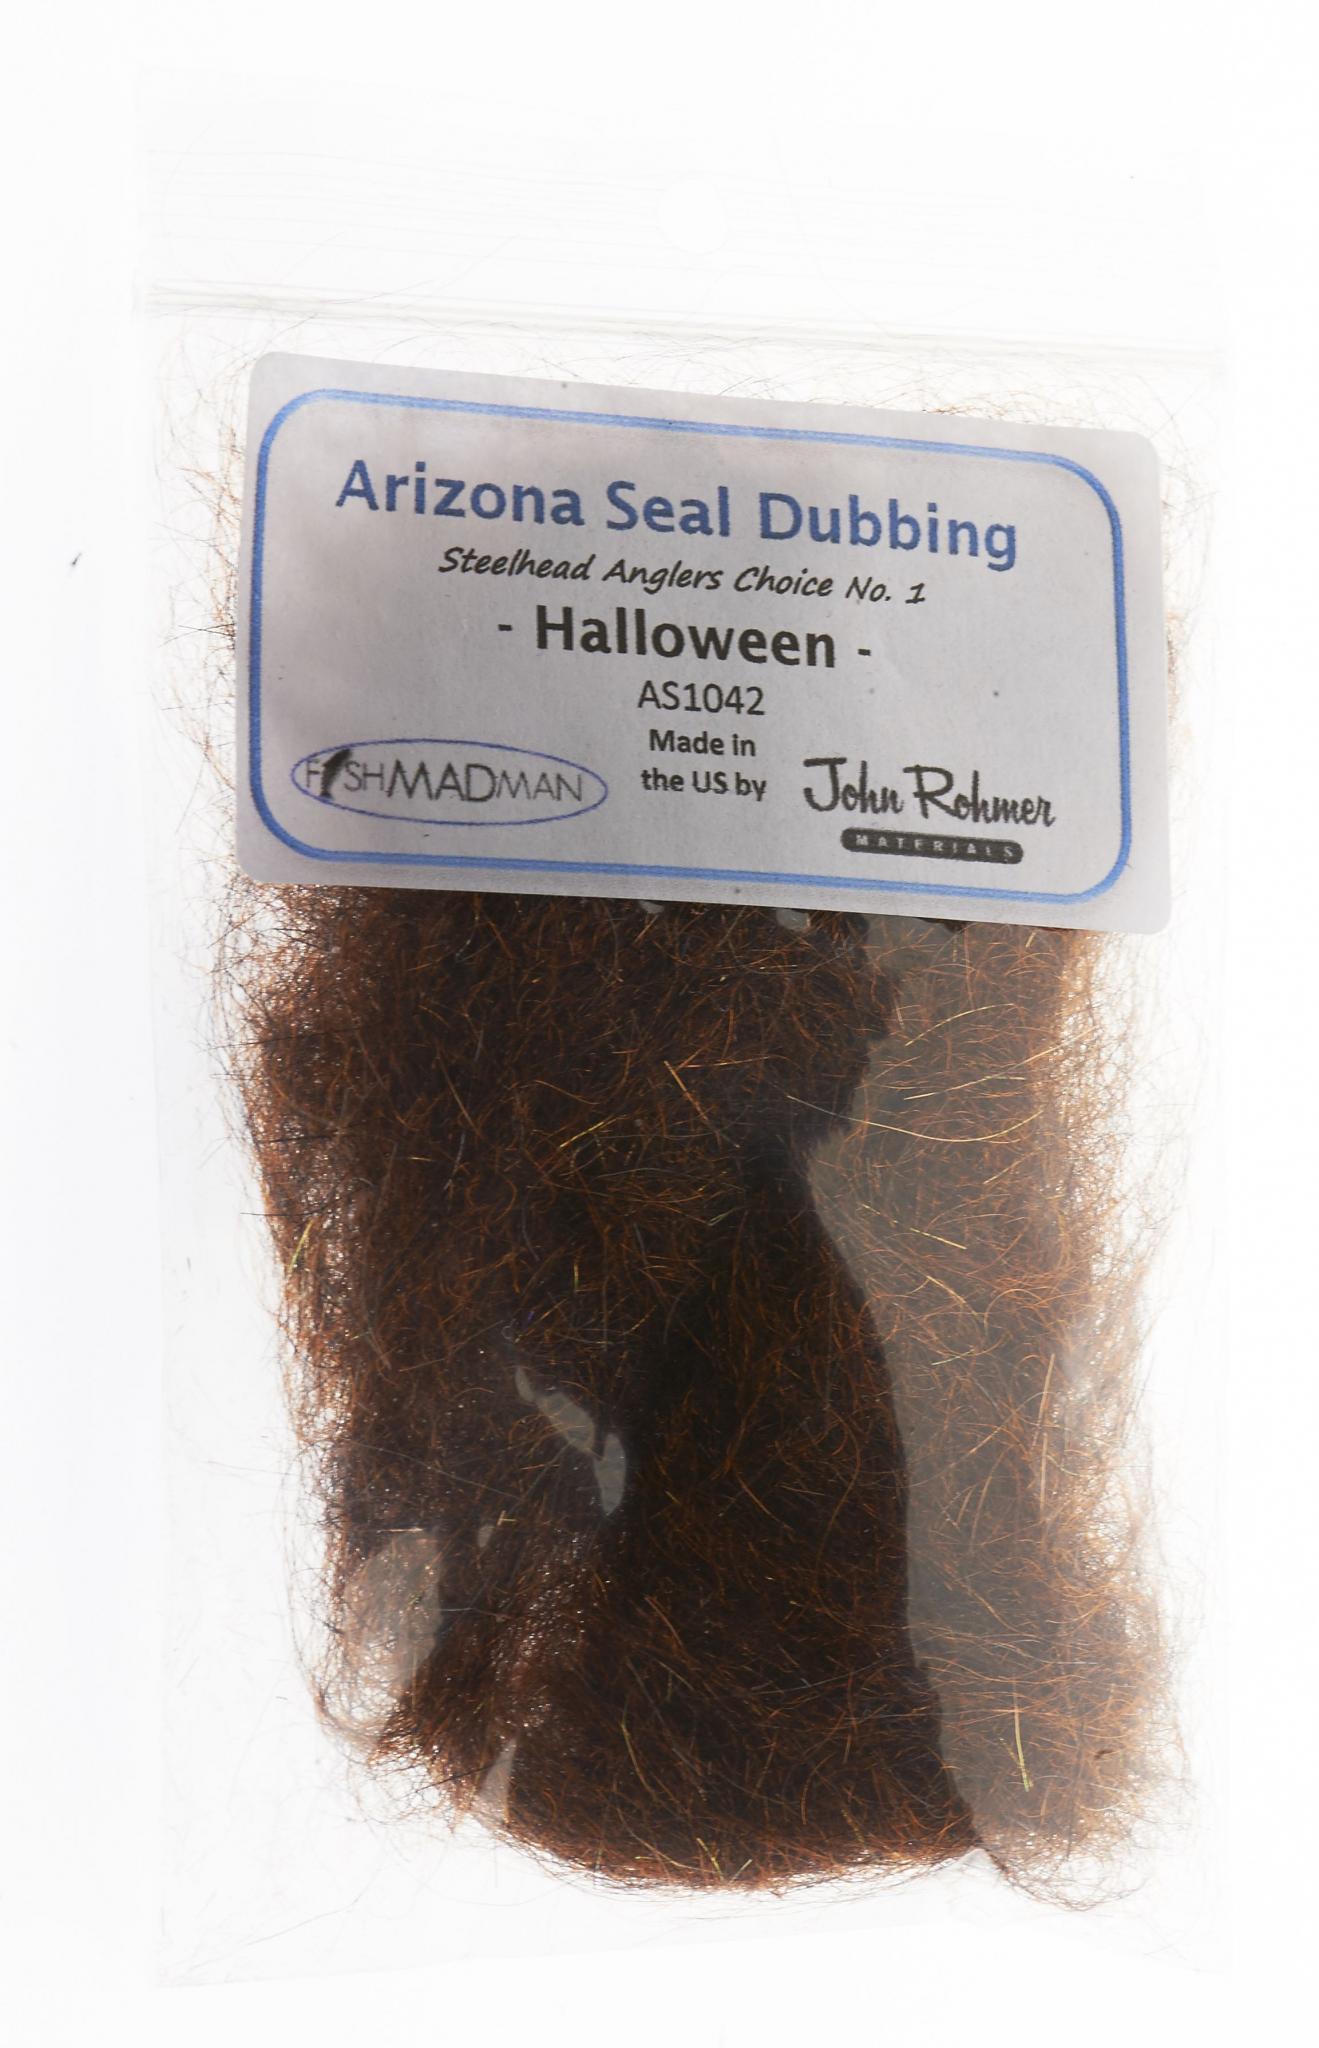 Arizona Simi Seal dubbing Halloween